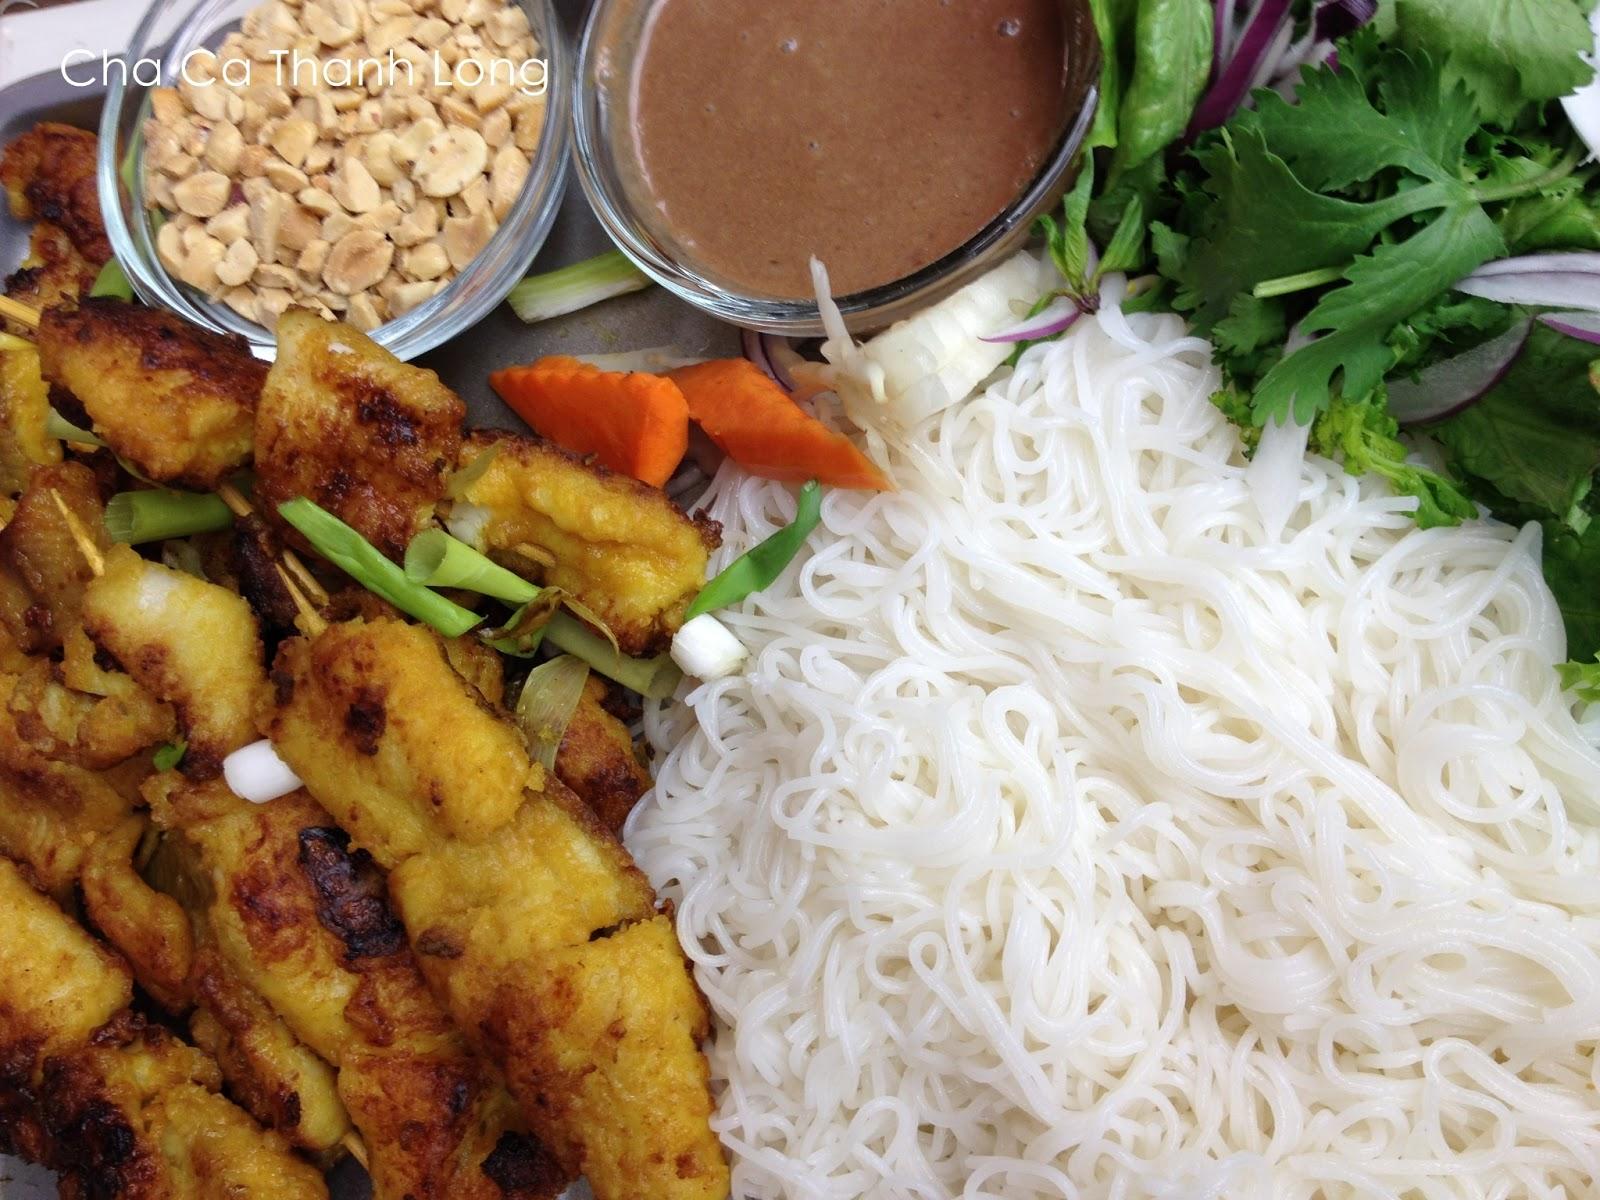 ... Ca Thang Long Recipe Vietnamese Grilled Fish Turmeric - Self Sagacity